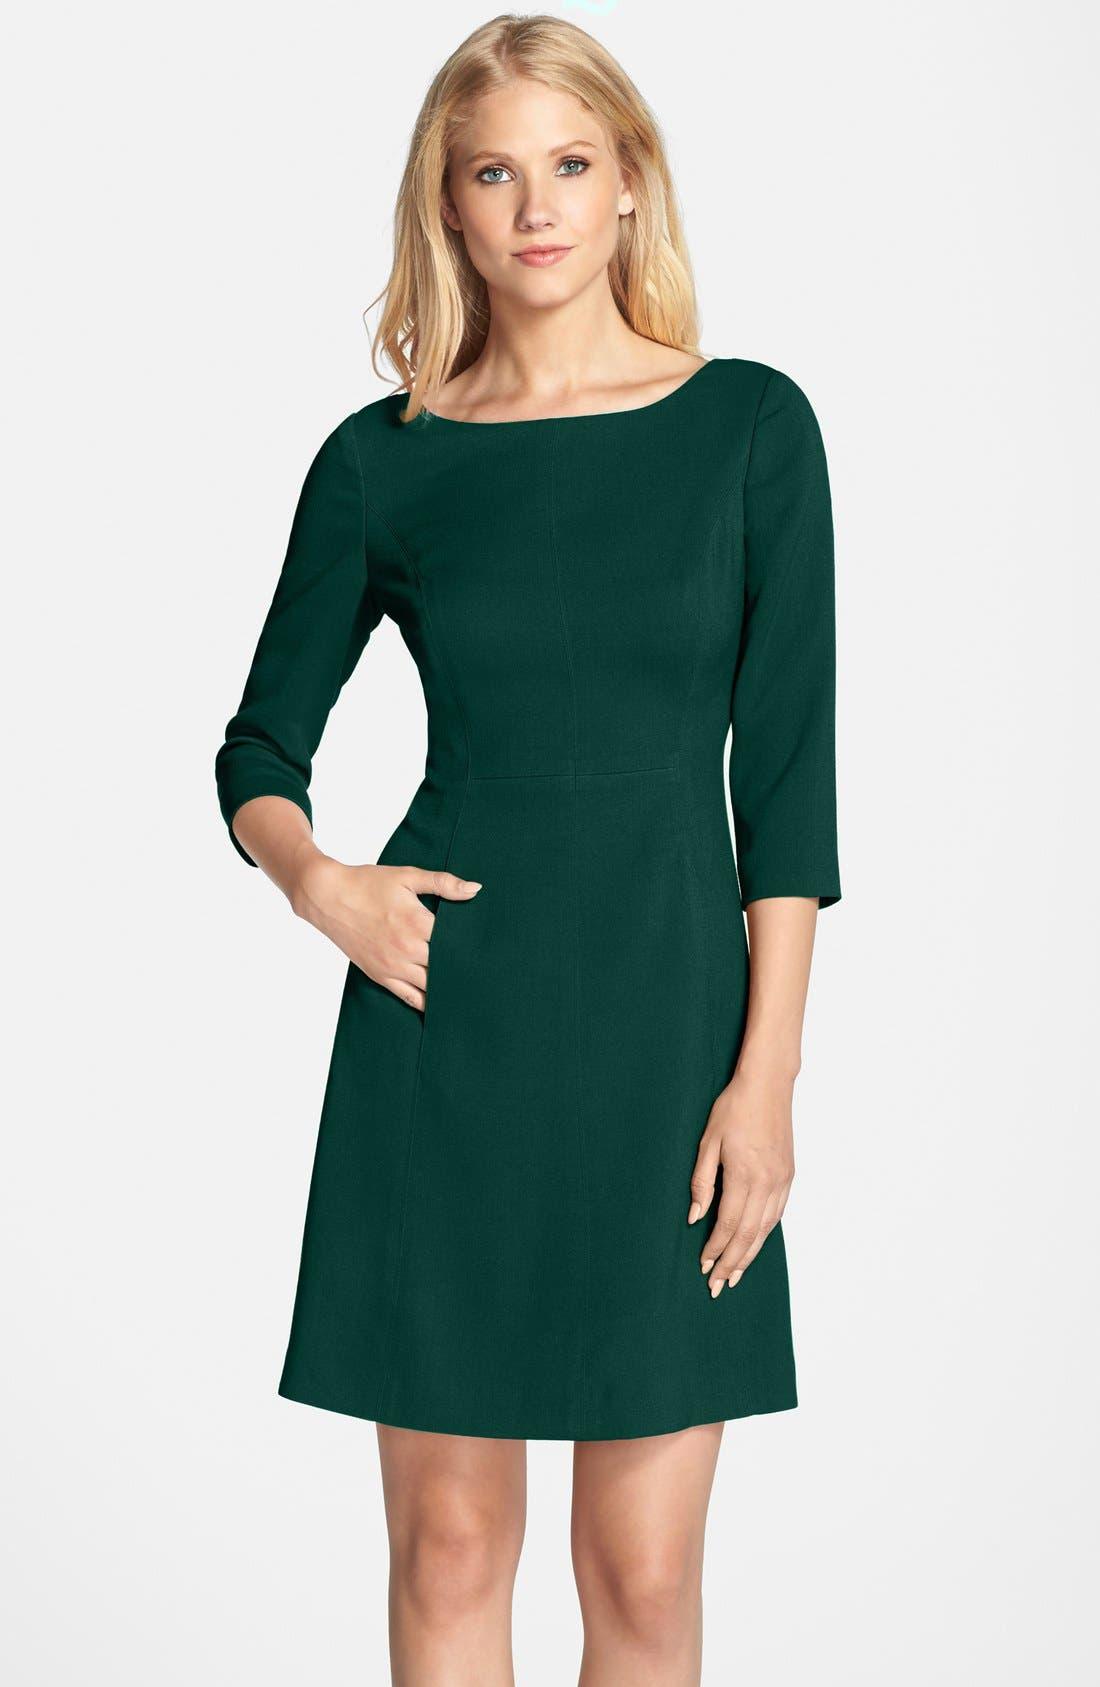 Alternate Image 1 Selected - Vince Camuto Crepe A-Line Dress (Regular & Petite)